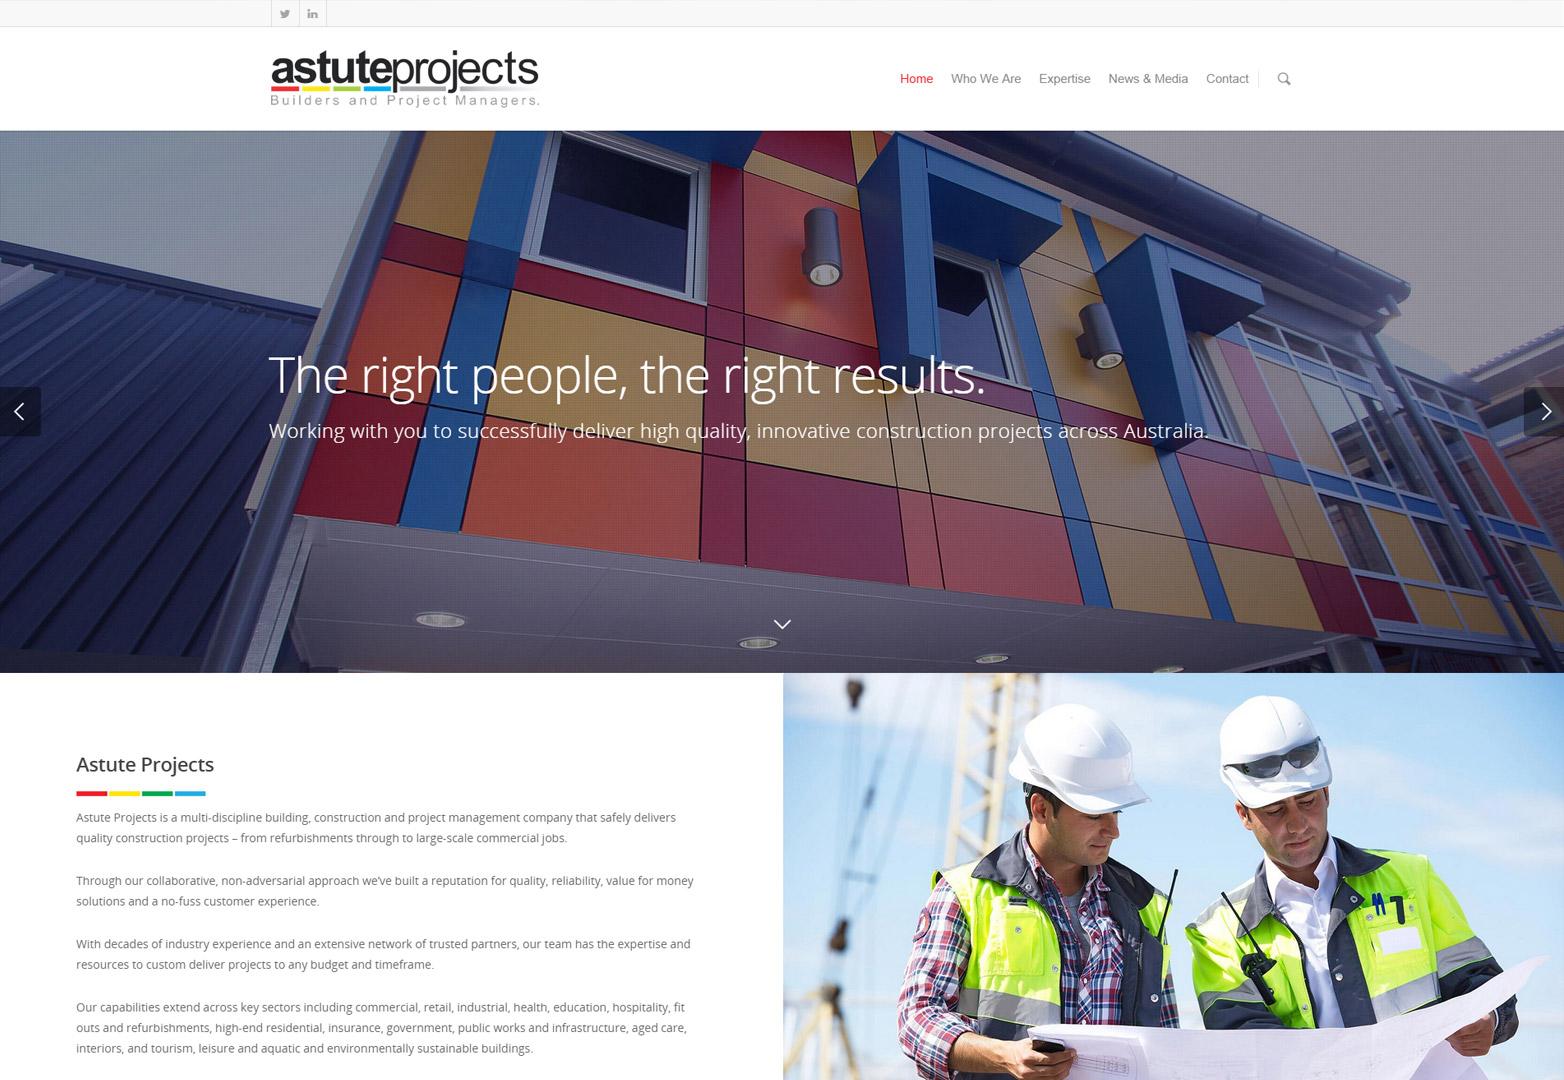 webdesign_astute